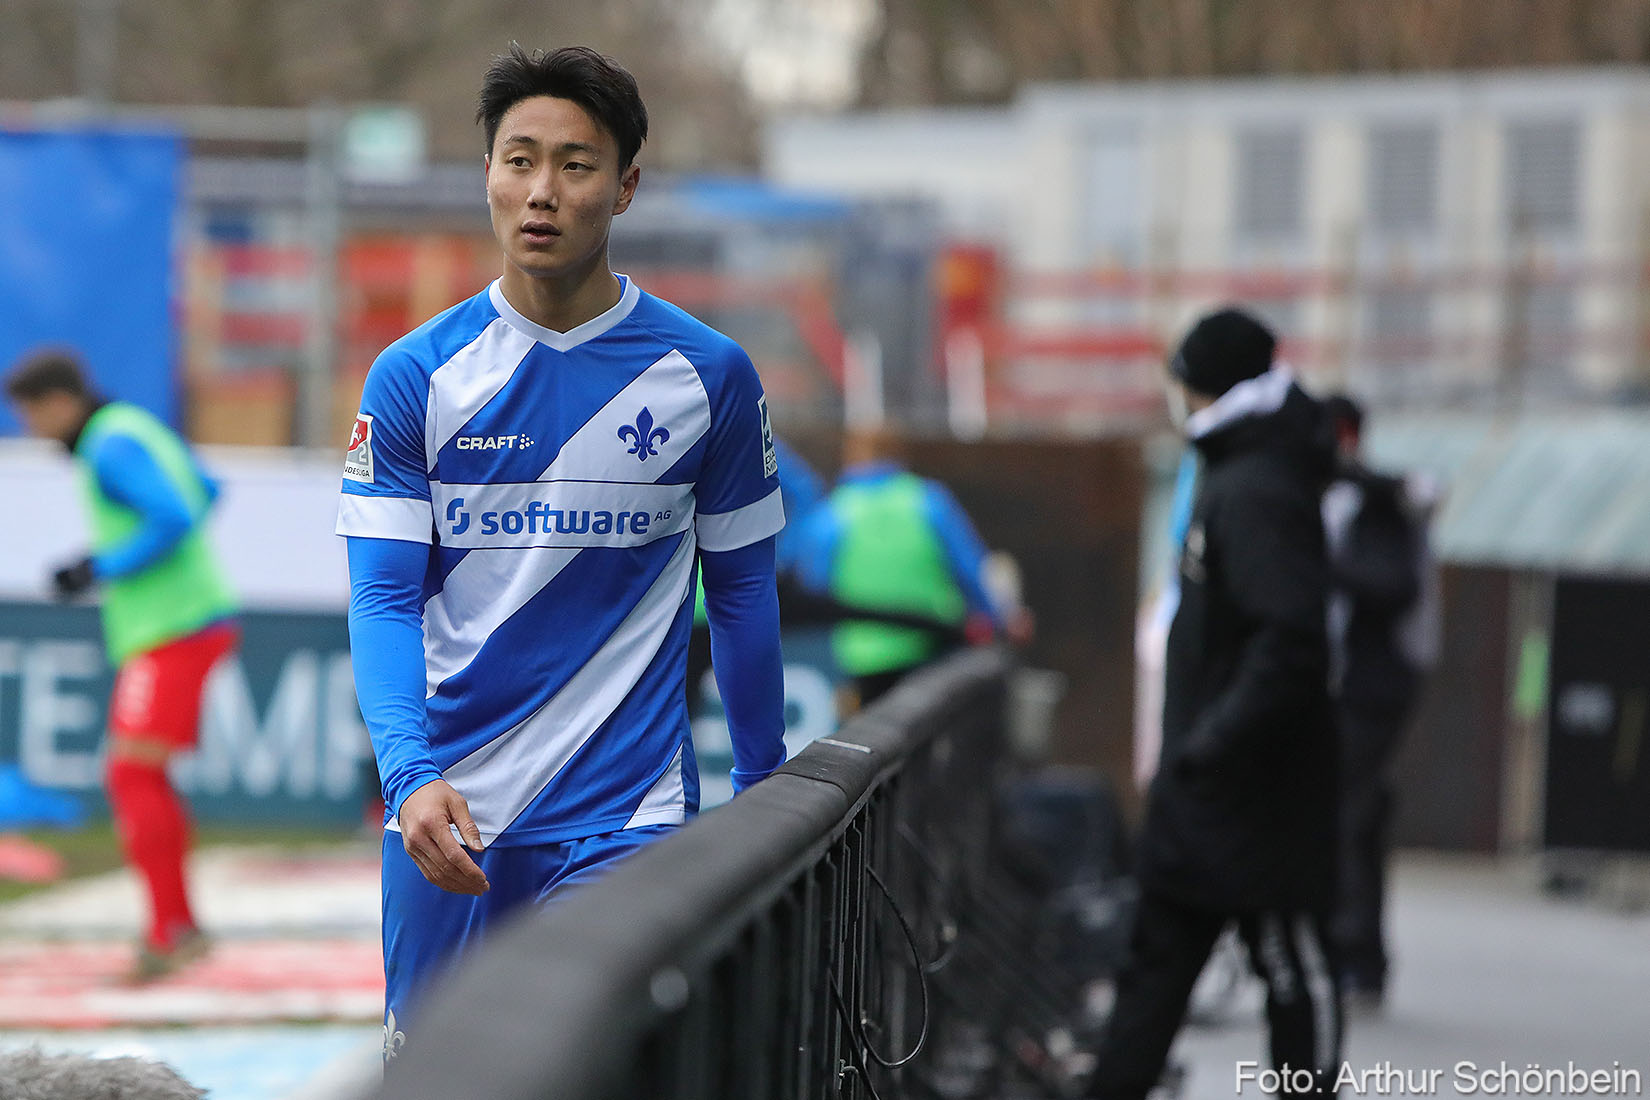 Offizielles Angebot für Seung-ho Paik aus Südkorea